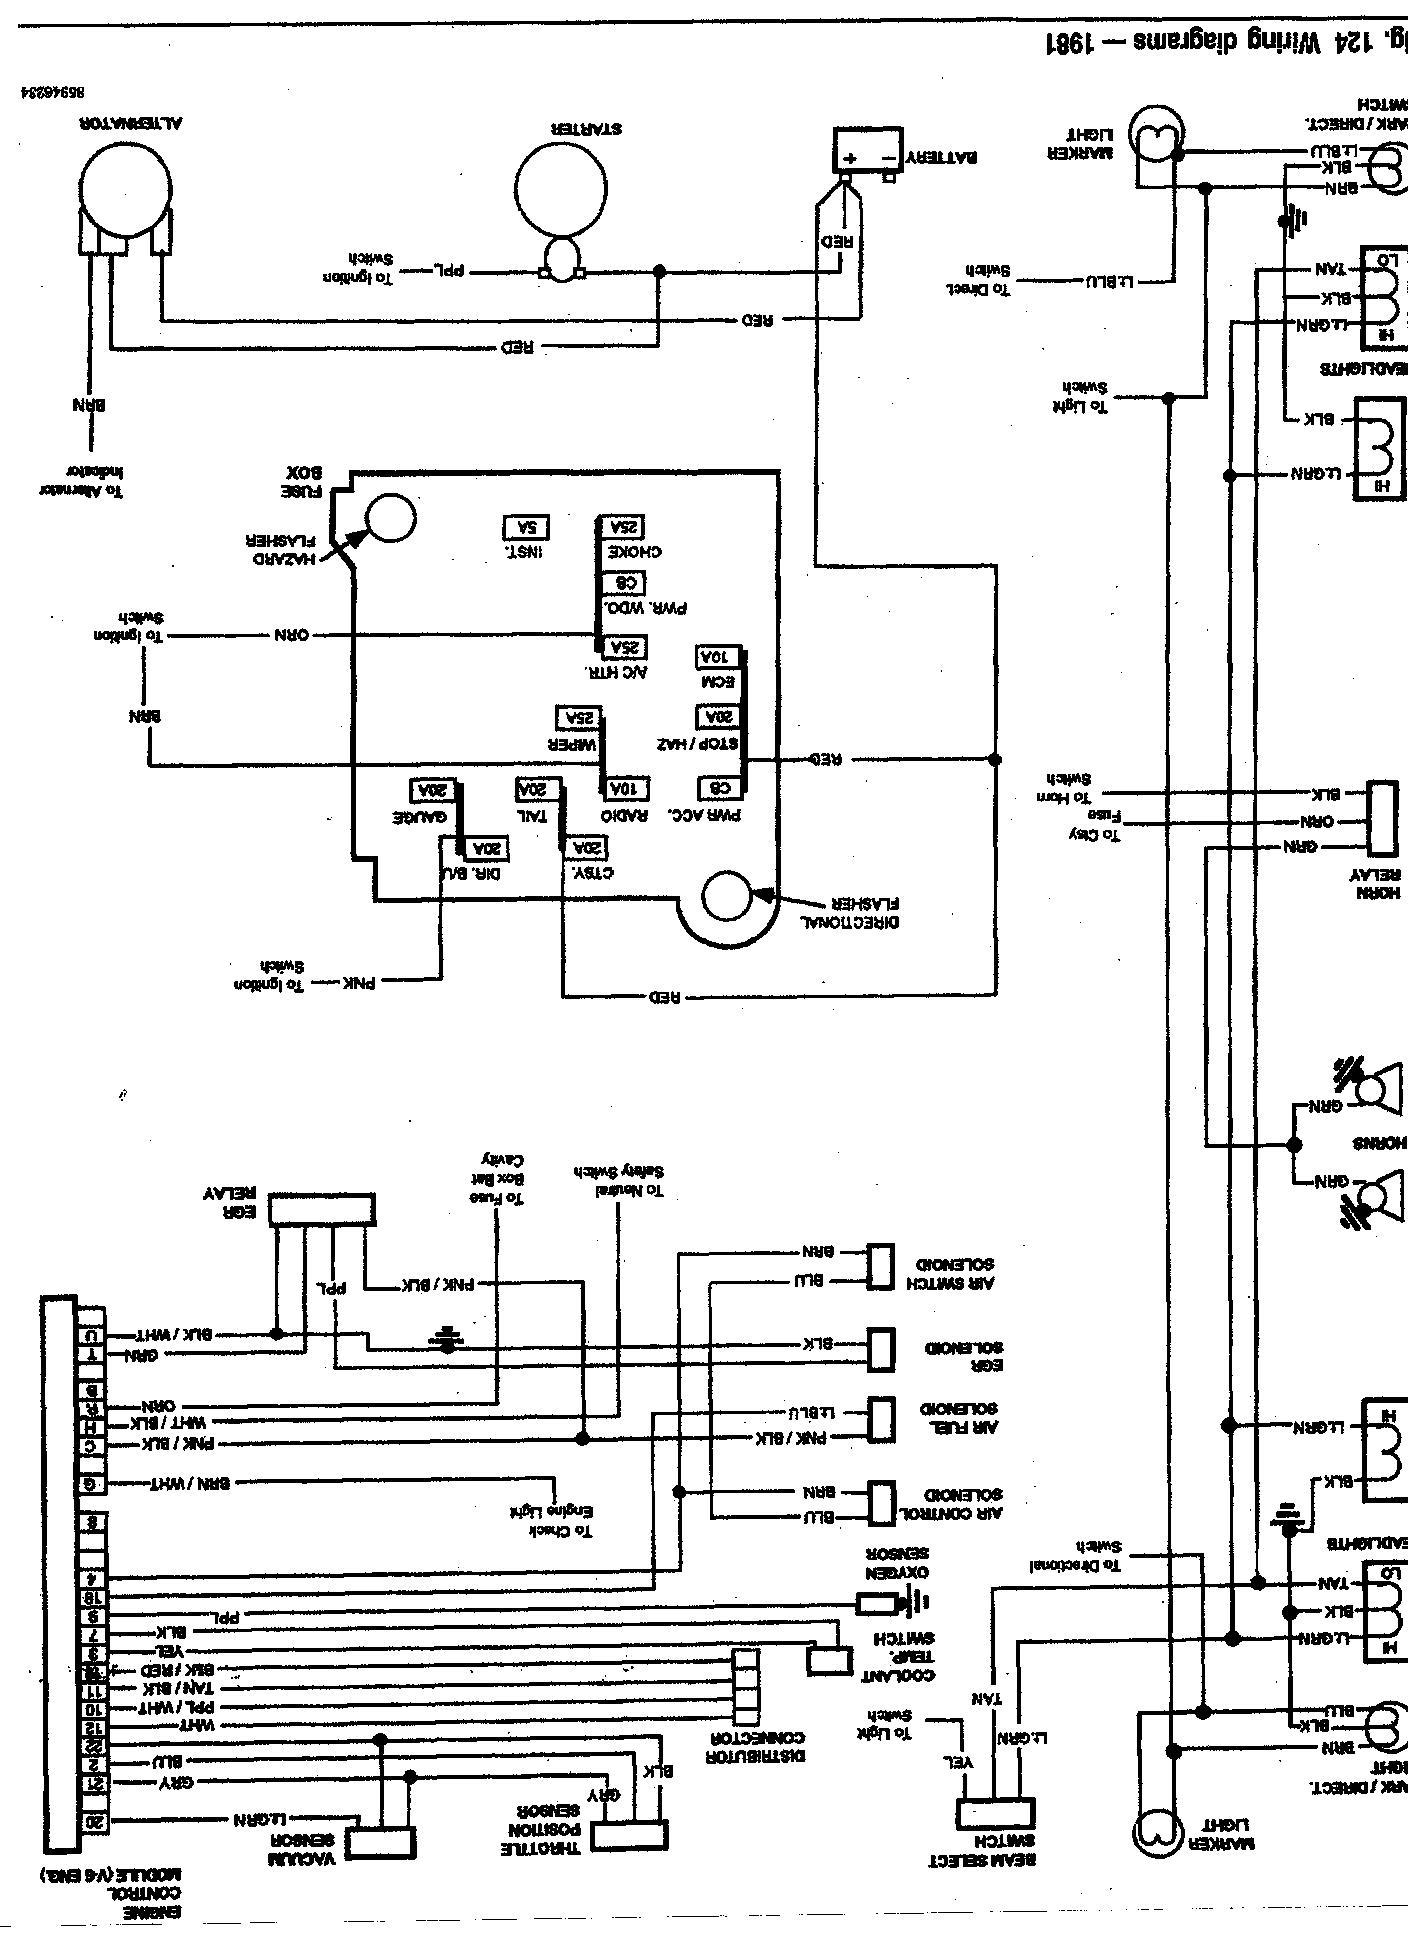 [SCHEMATICS_48YU]  HM_4201] 1983 Chevrolet El Camino Wiring Diagram Wiring Diagrams Download  Diagram   1983 El Camino Engine Diagram      Hyedi Kicep Mohammedshrine Librar Wiring 101